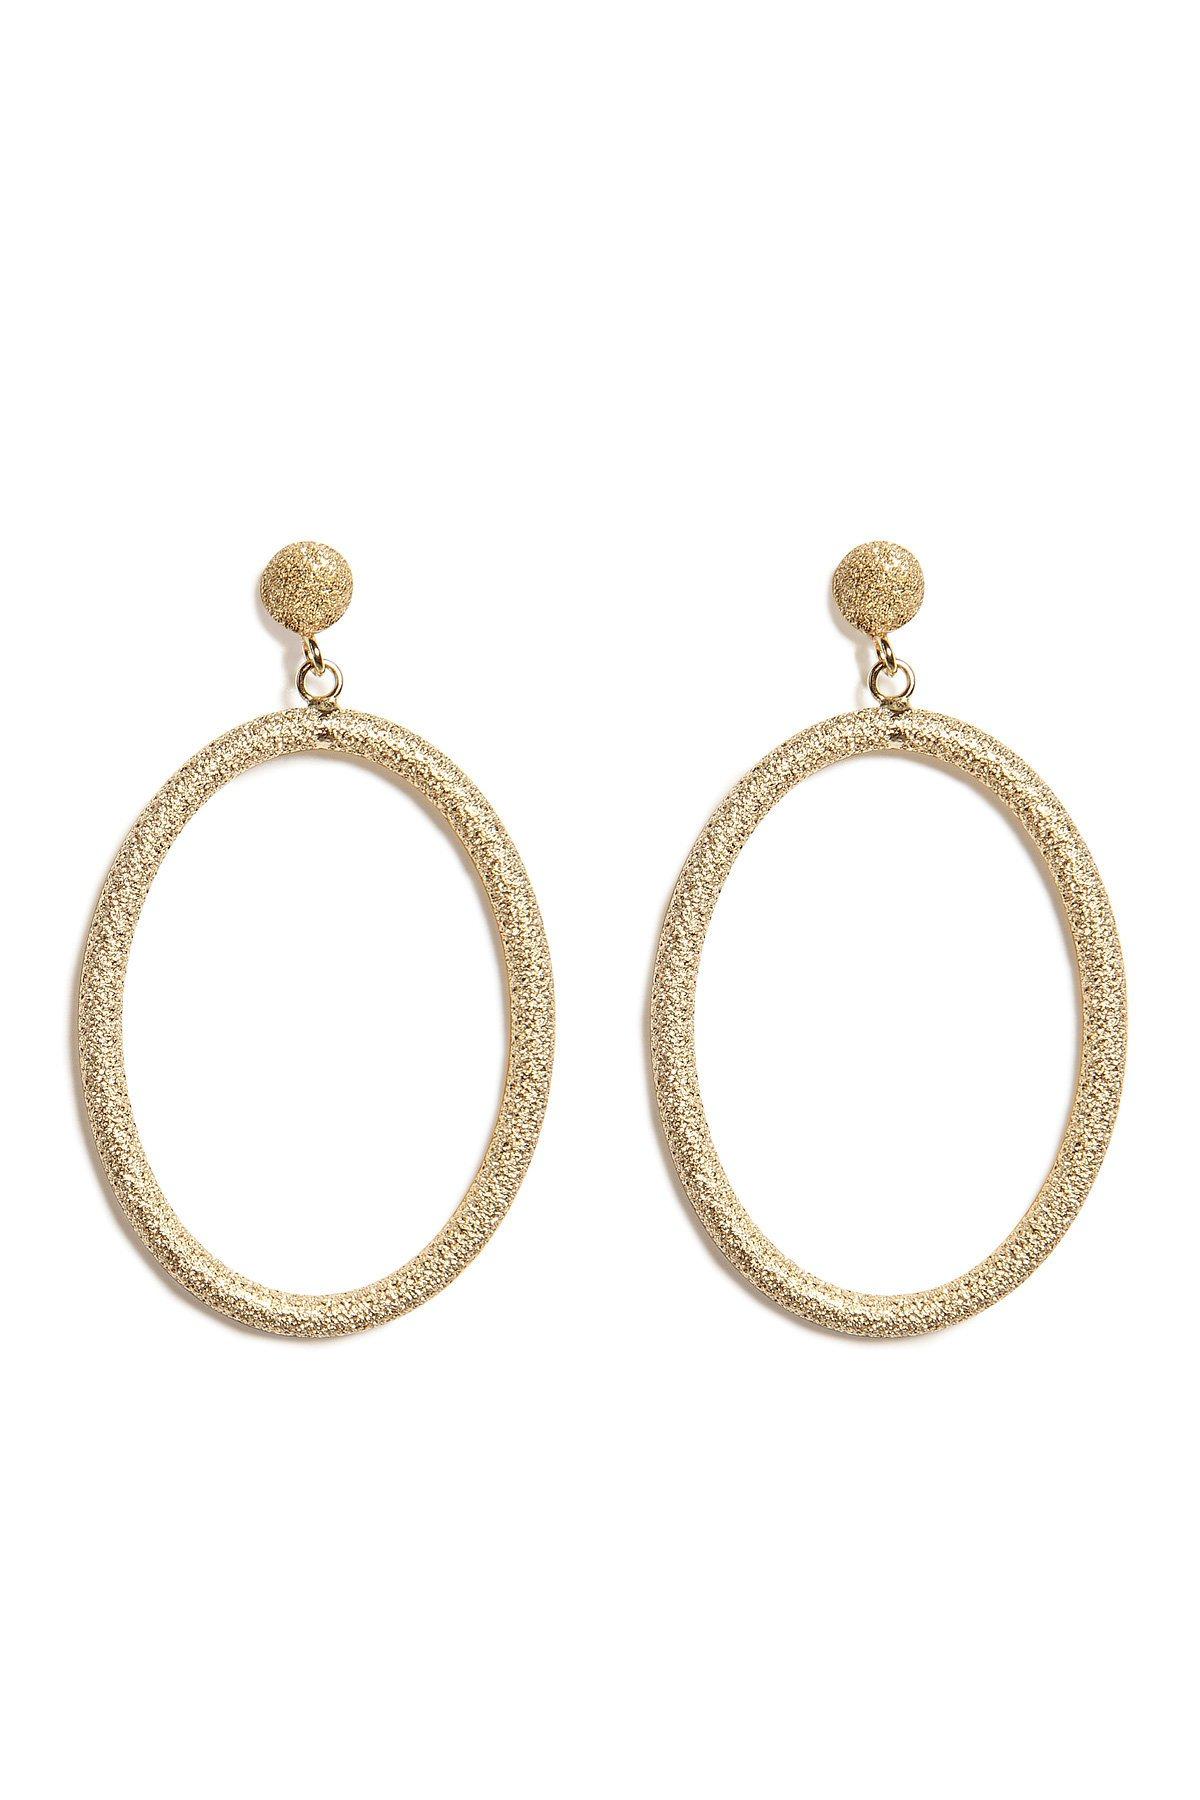 18K Gold Gitane Sparkly Oval Earrings Gr. One Size